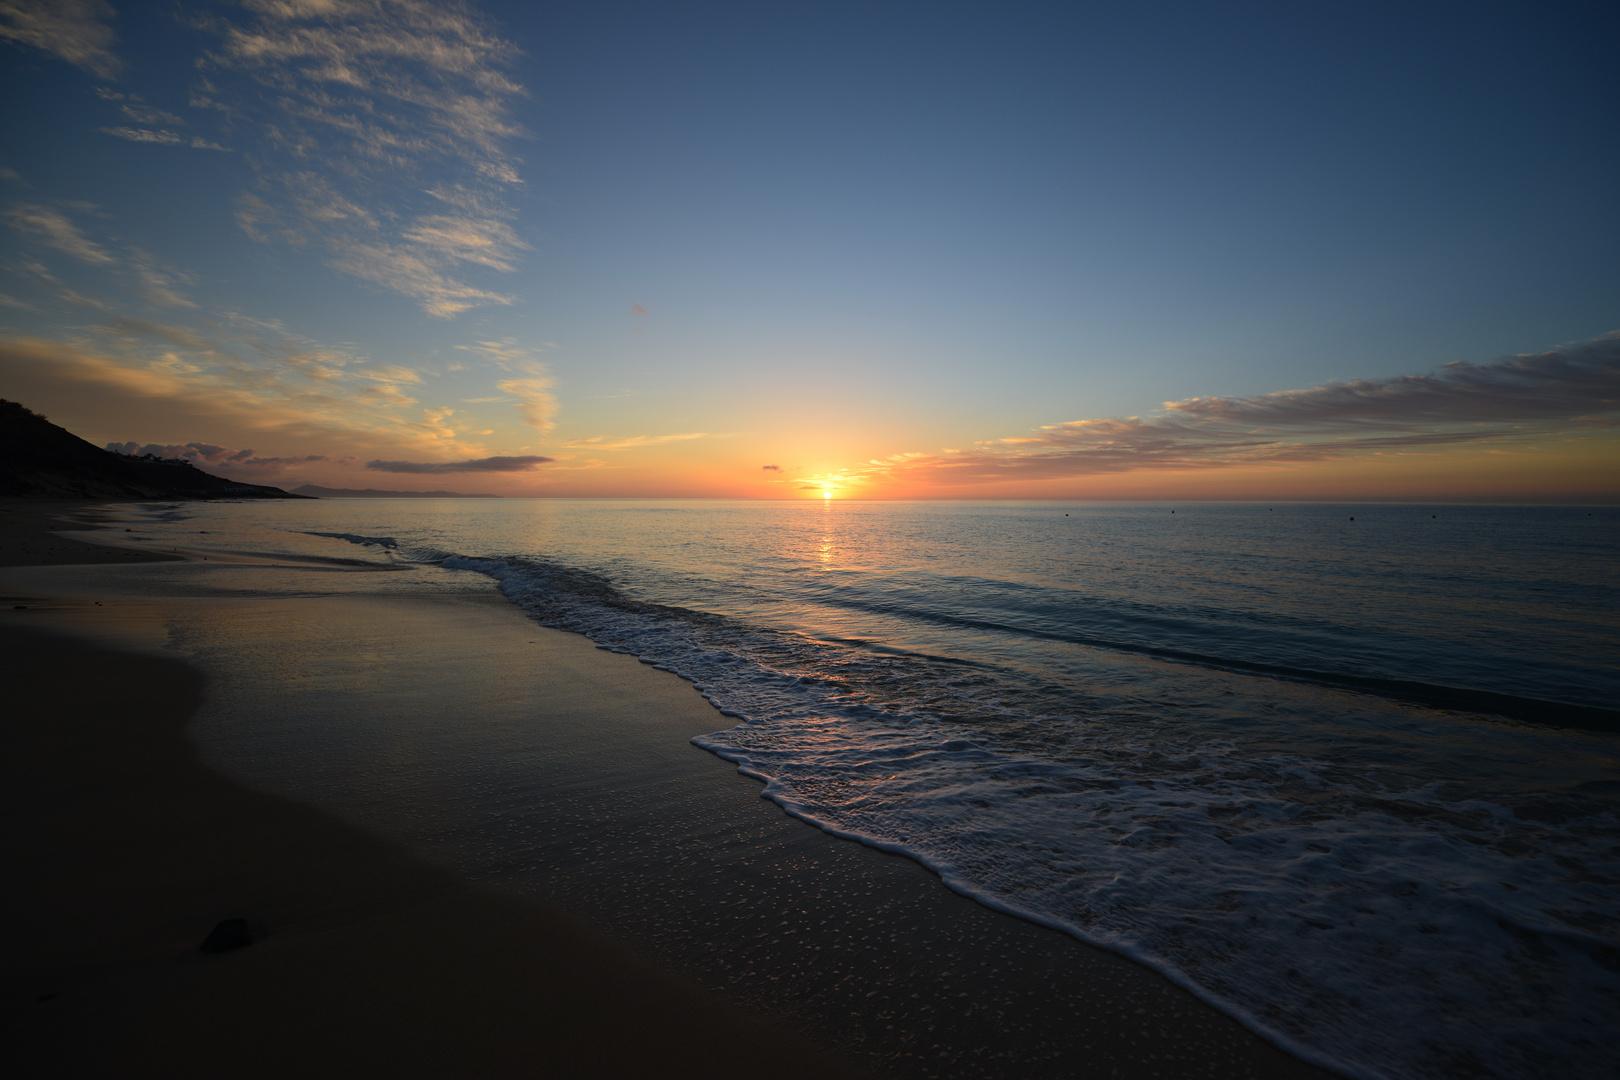 Sunrise at Esquinzo Playa